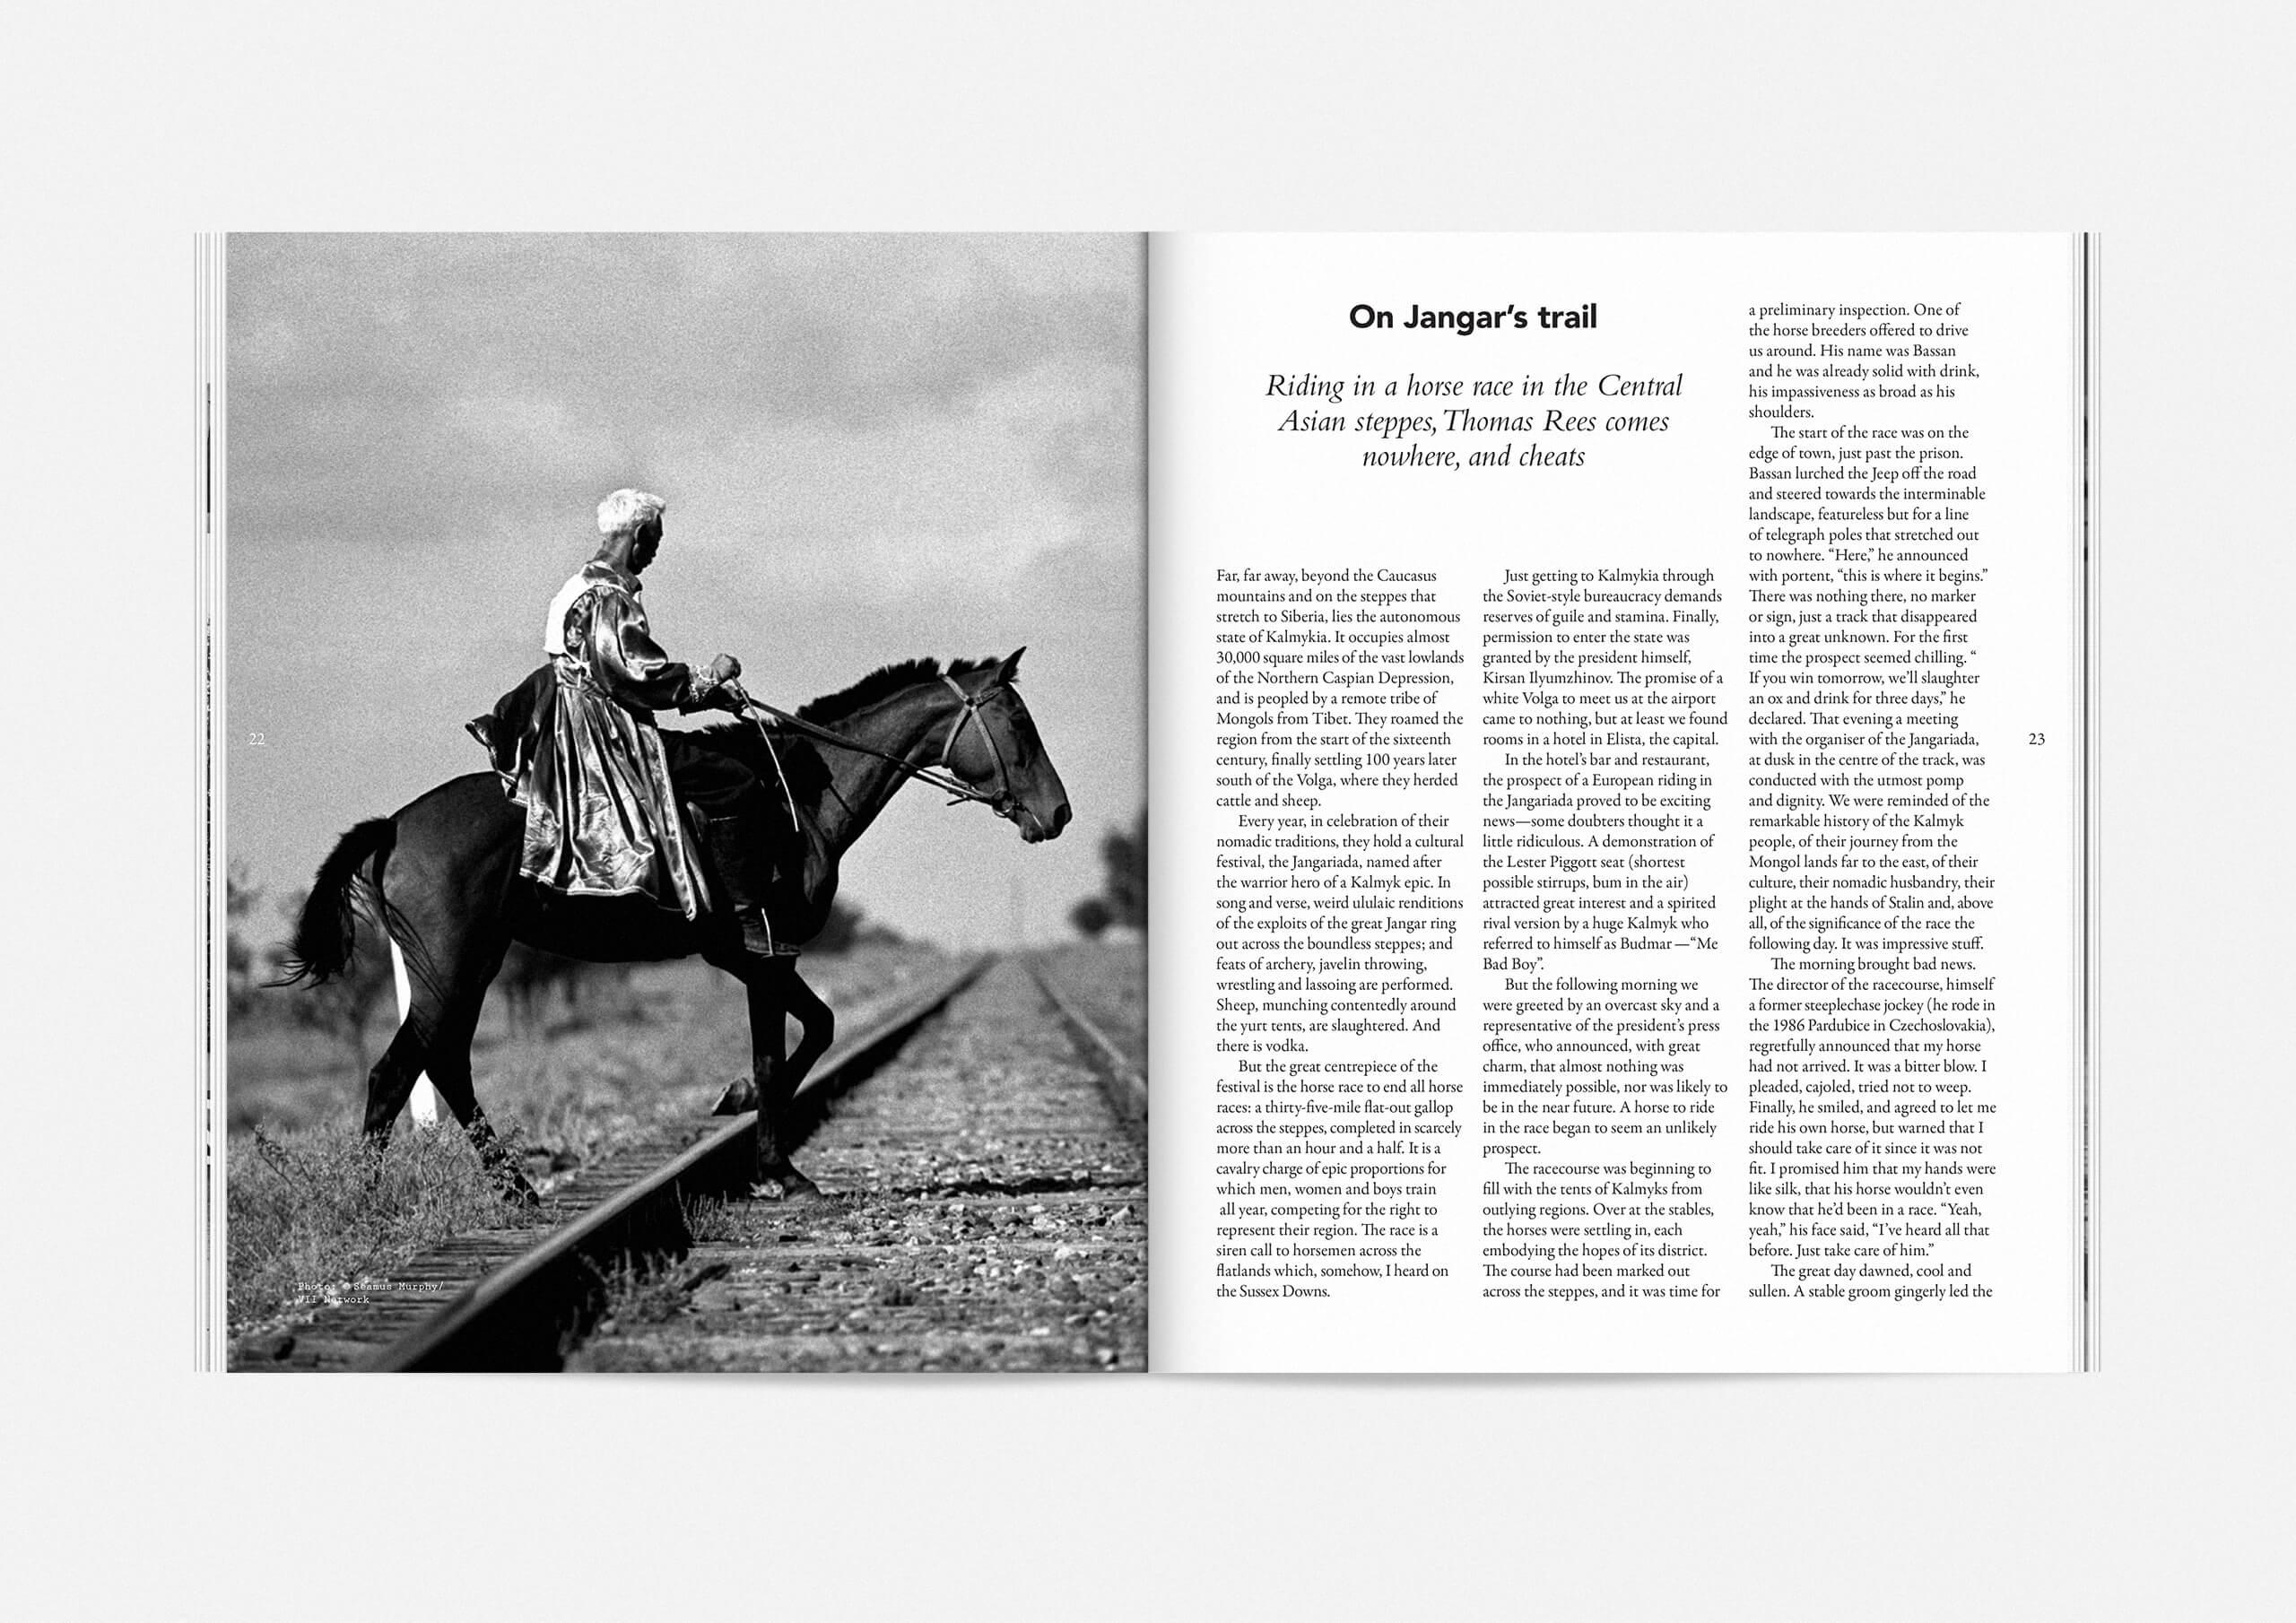 https://neuegestaltung.de/media/pages/clients/teller-magazine-issue-1/ea1295307e-1597415428/teller_issue_01_innenseite_22_23_ng.jpg